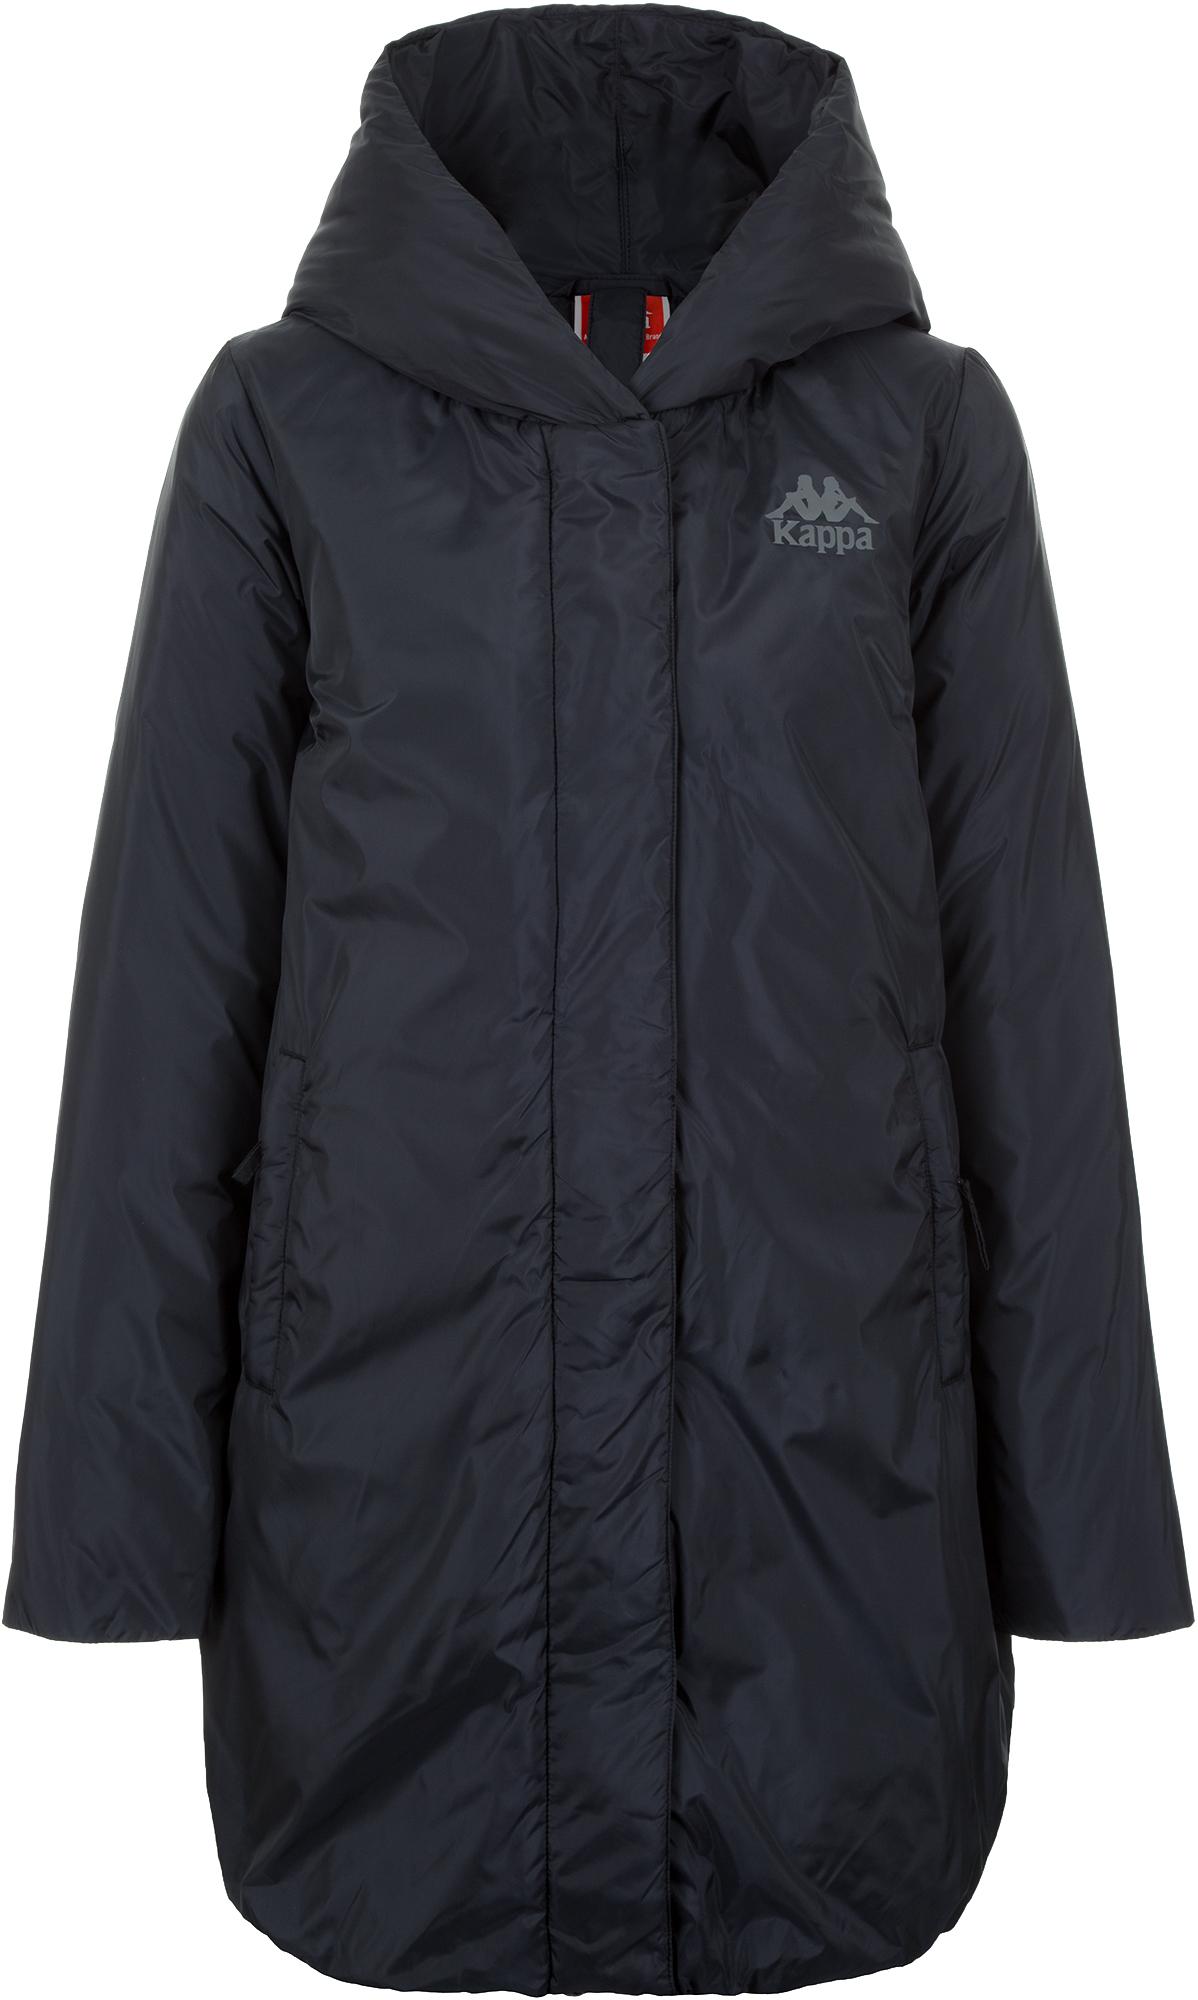 Kappa Куртка утепленная женская Kappa, размер 48